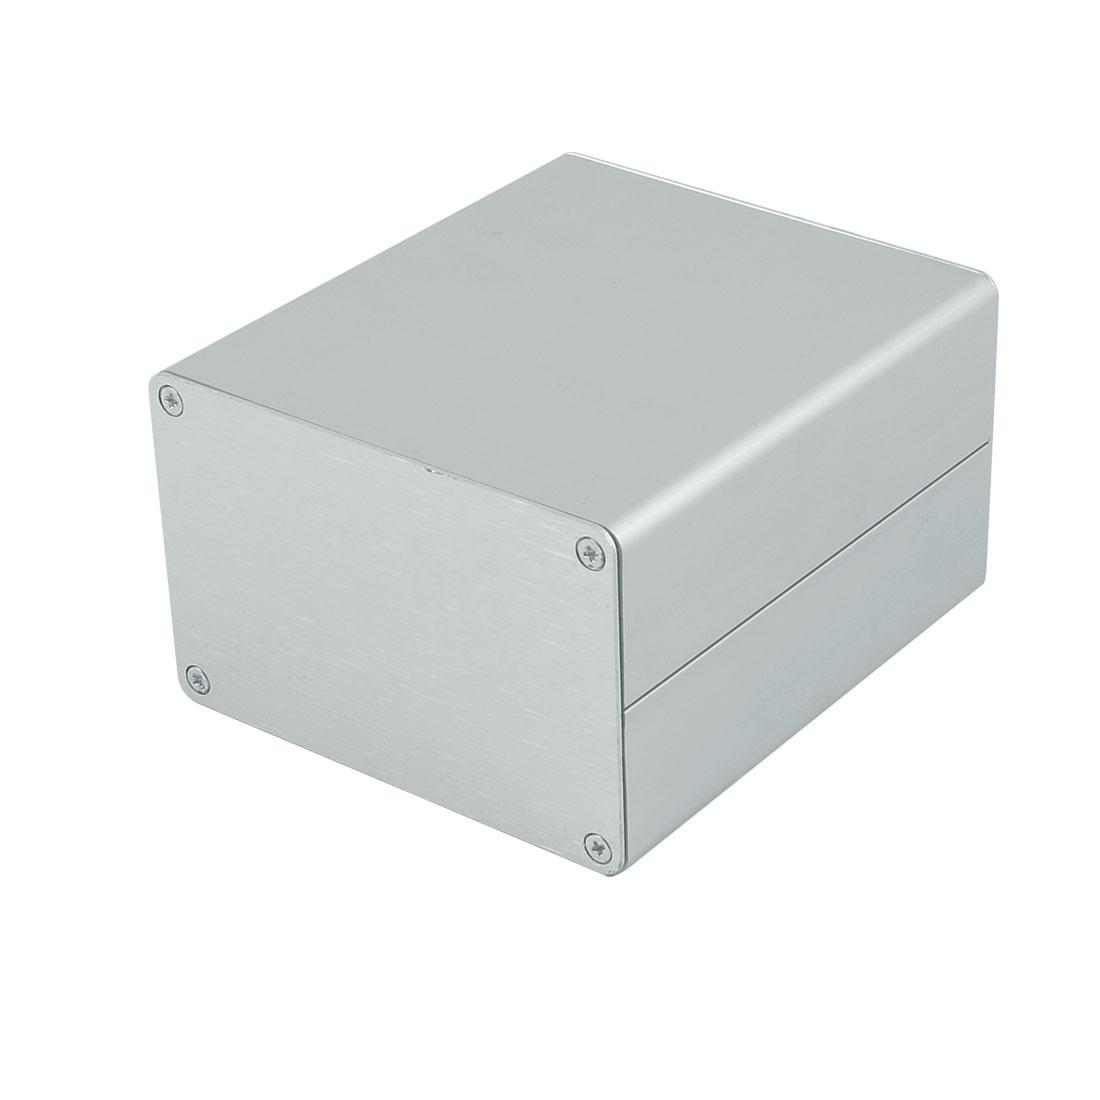 102 x 90 x 59mm Multi-purpose Electronic Extruded Aluminum Enclosure Box Black